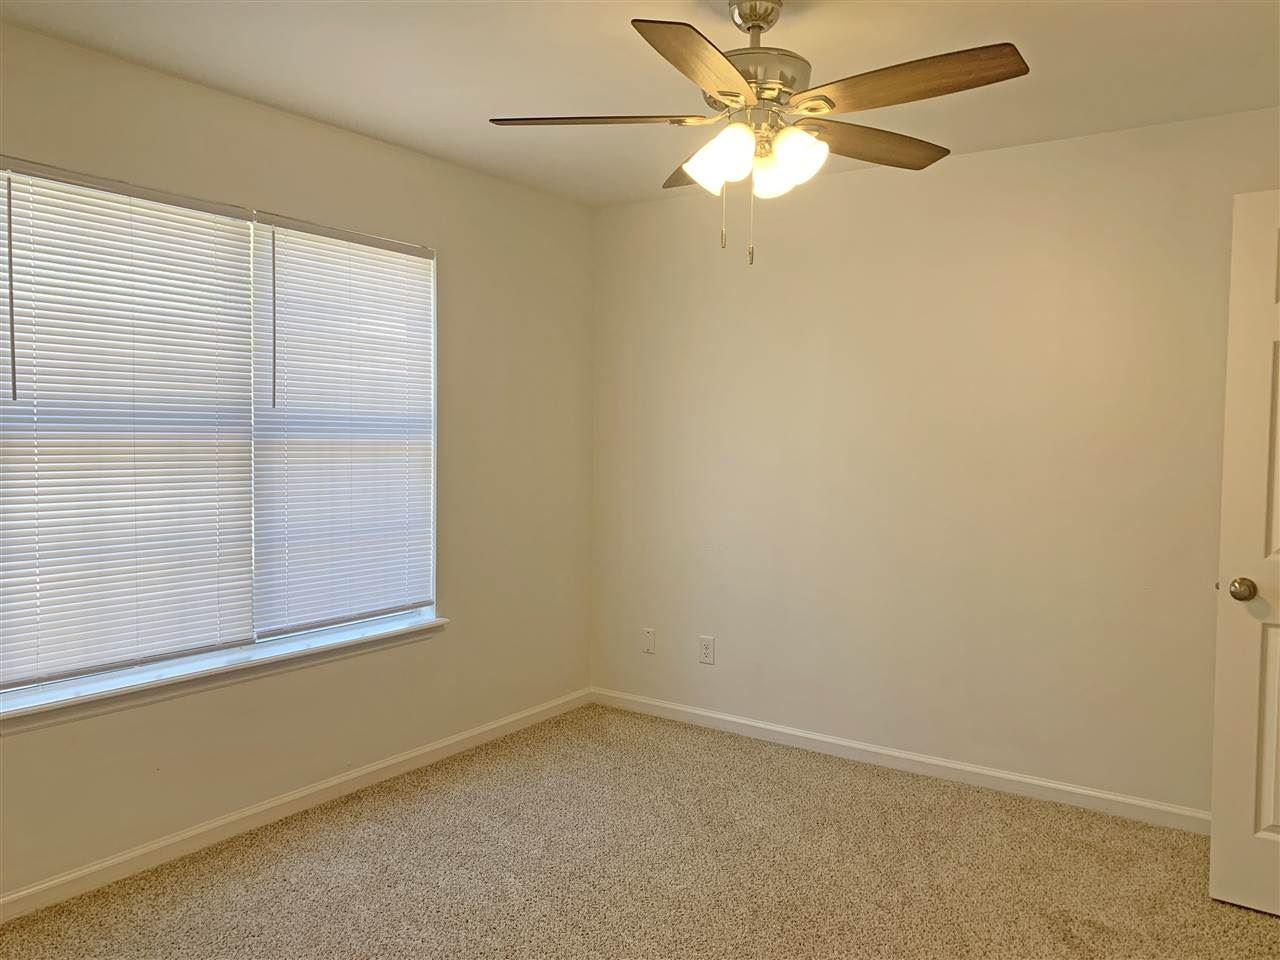 Photo of 2791 Tess Circle, TALLAHASSEE, FL 32304 (MLS # 330999)